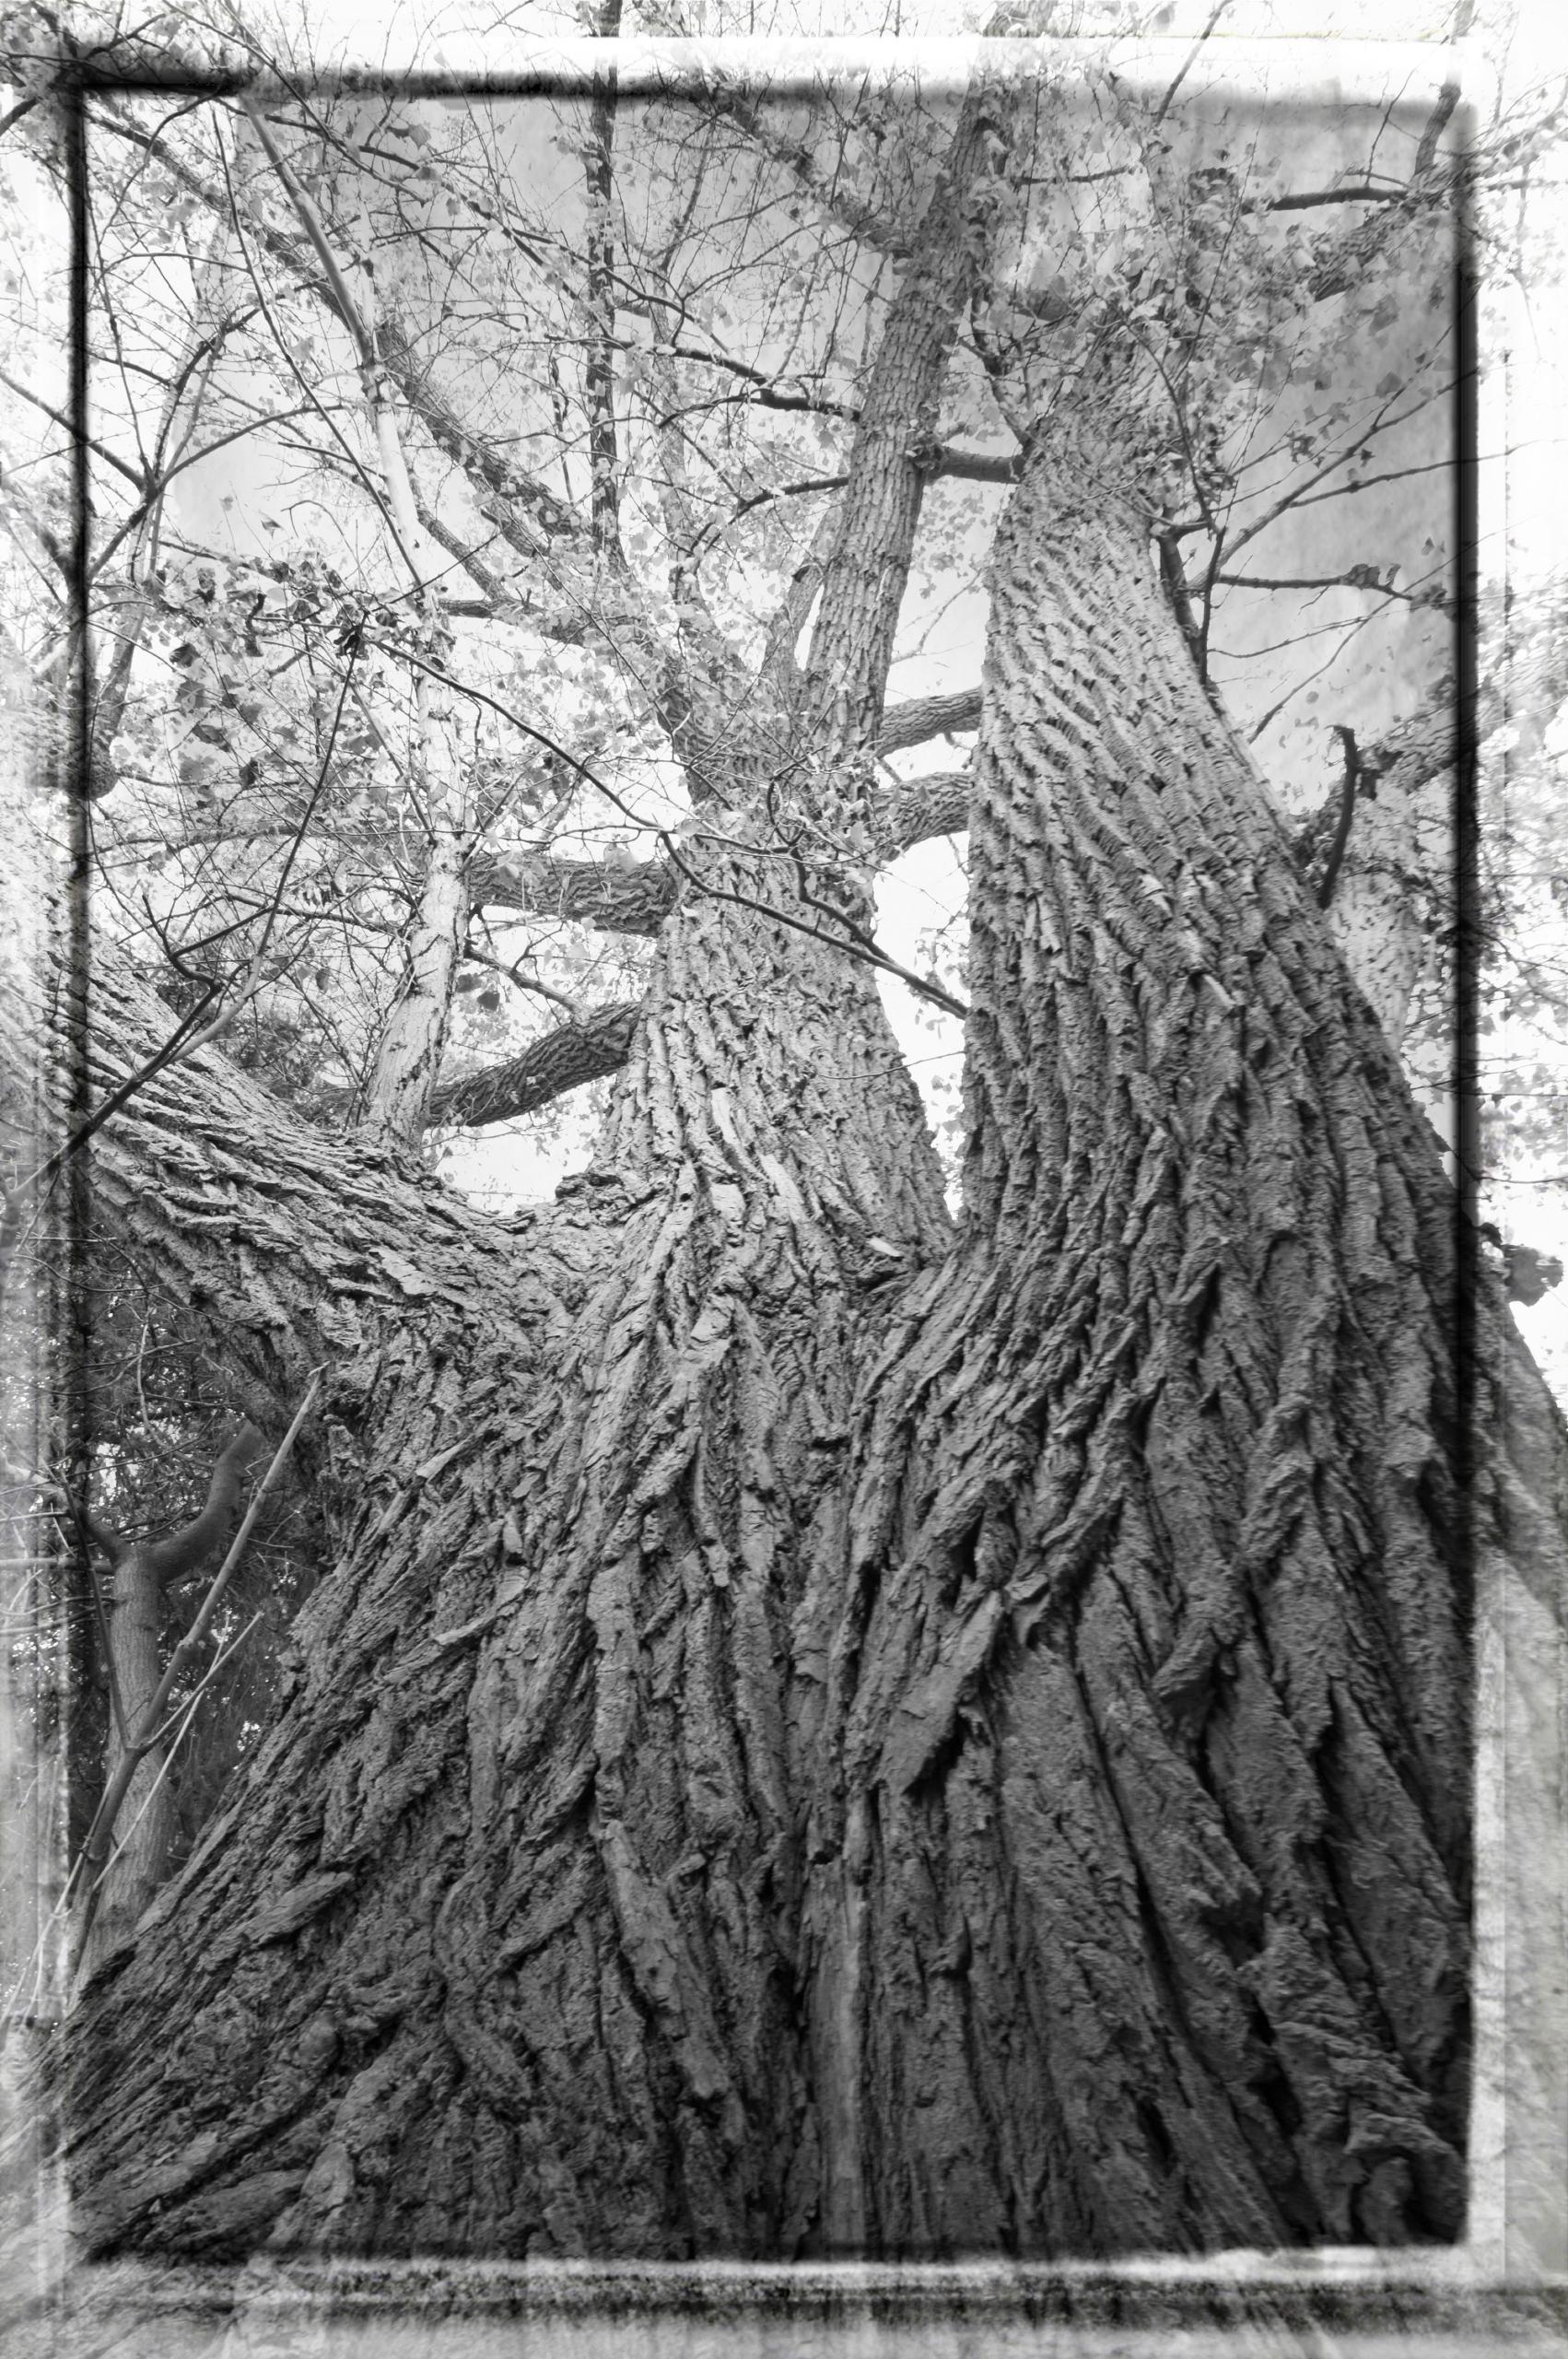 Cottonwood Looking Up